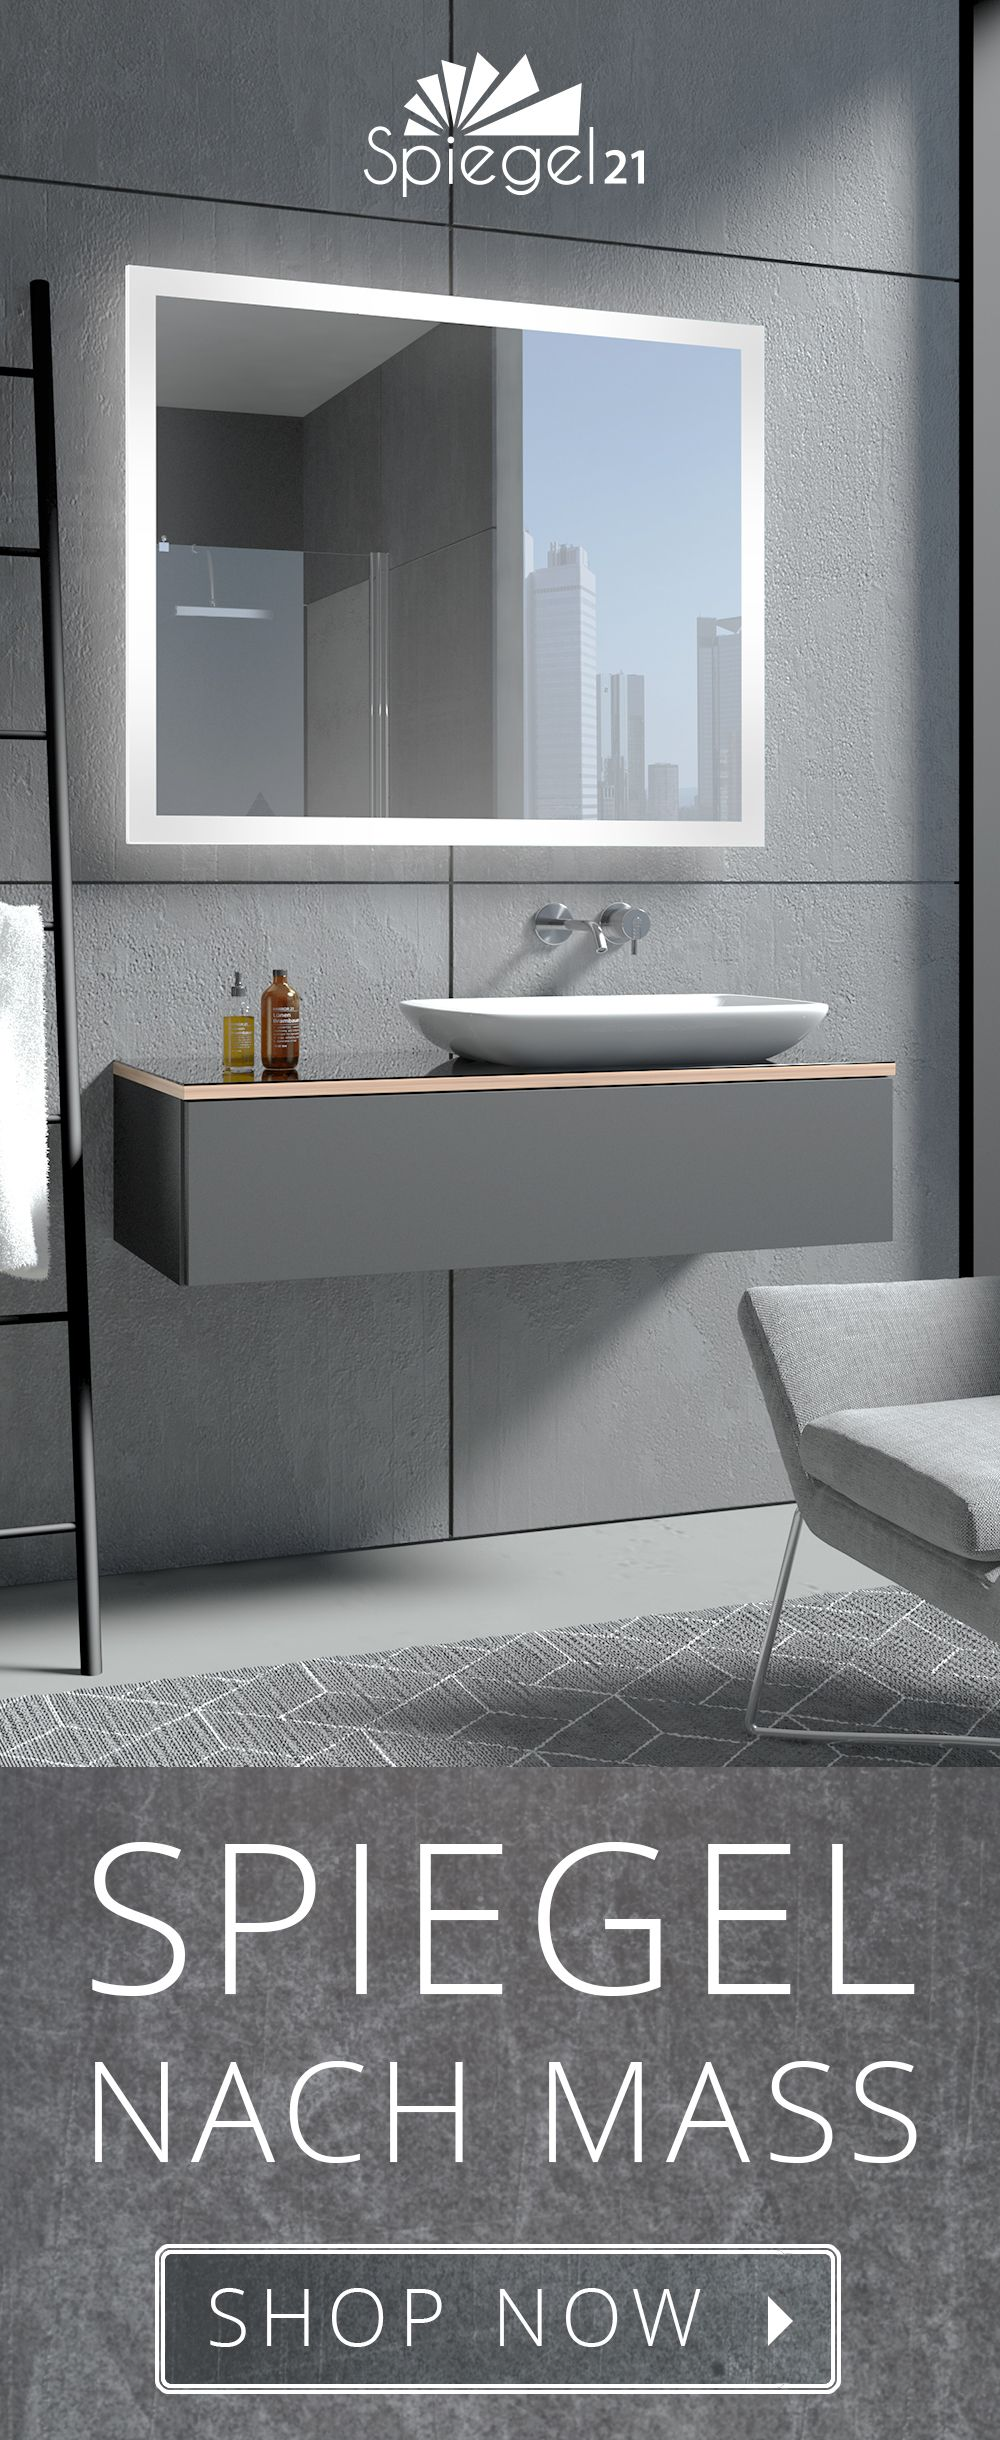 Led Badspiegel New York Stilvoller Spiegel Mit Beleuchtung Badspiegel Spiegel Mit Beleuchtung Badspiegel Led